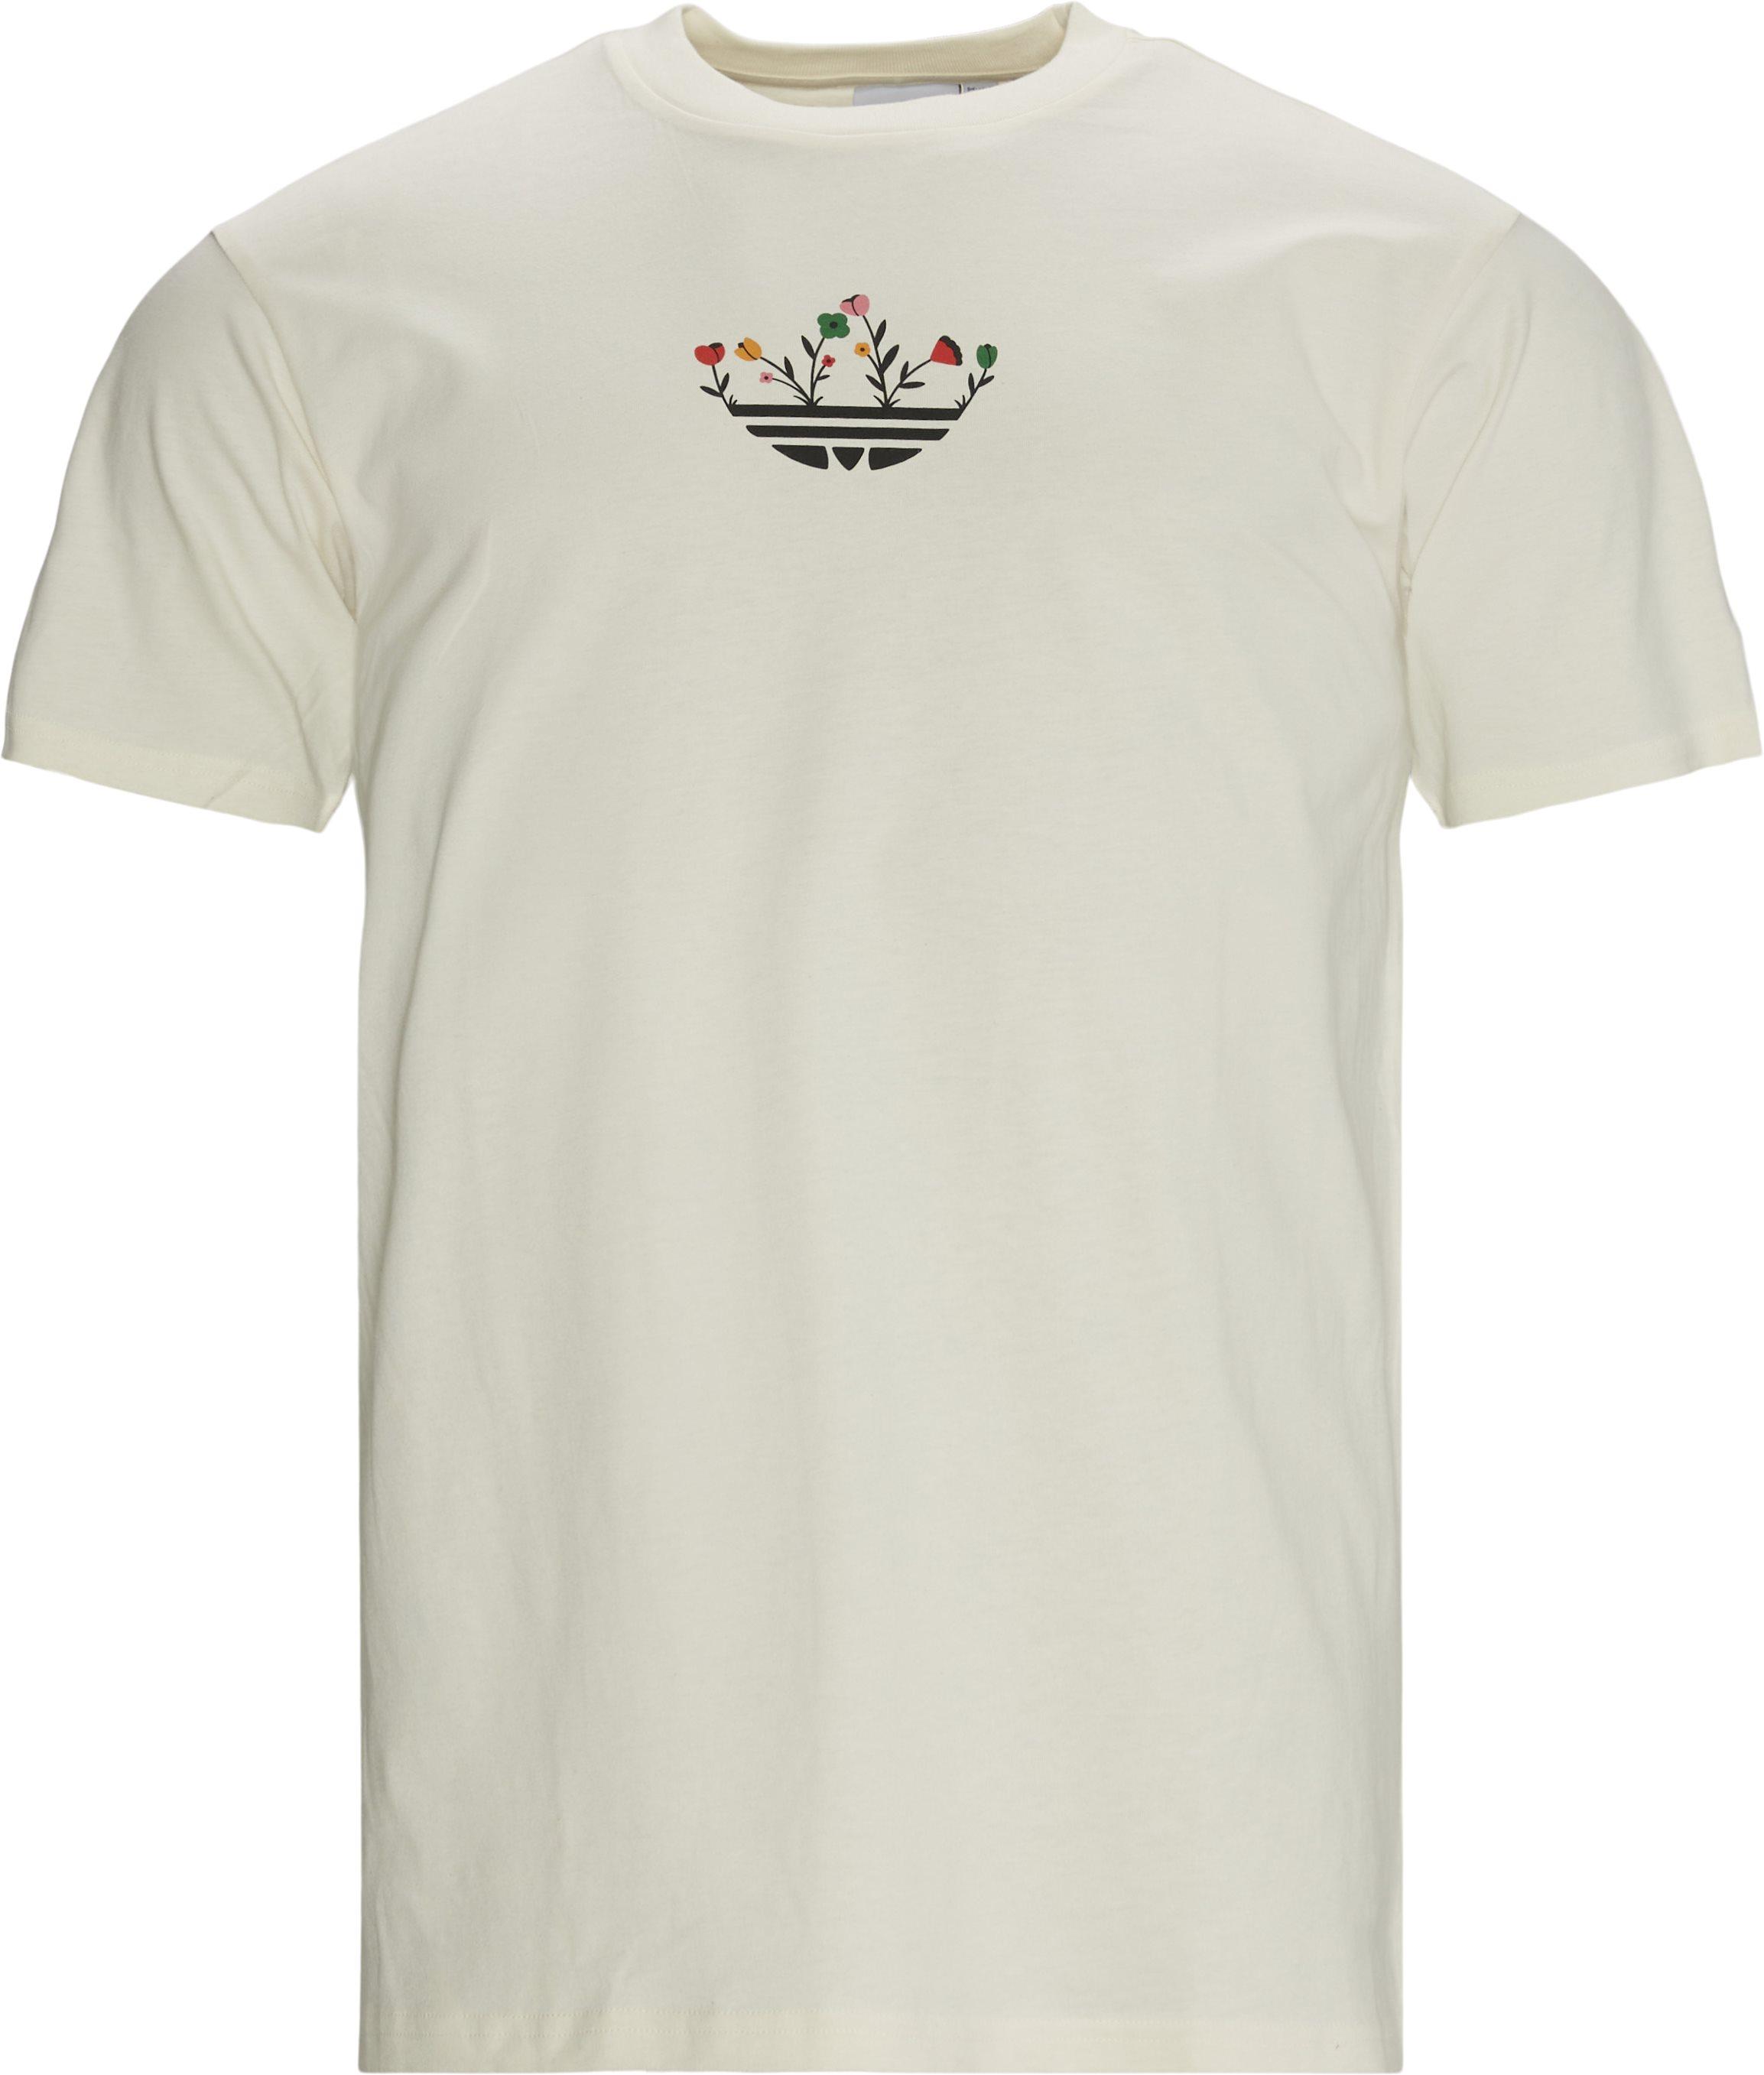 Trefoil Bloom Tee - T-shirts - Regular fit - Hvid